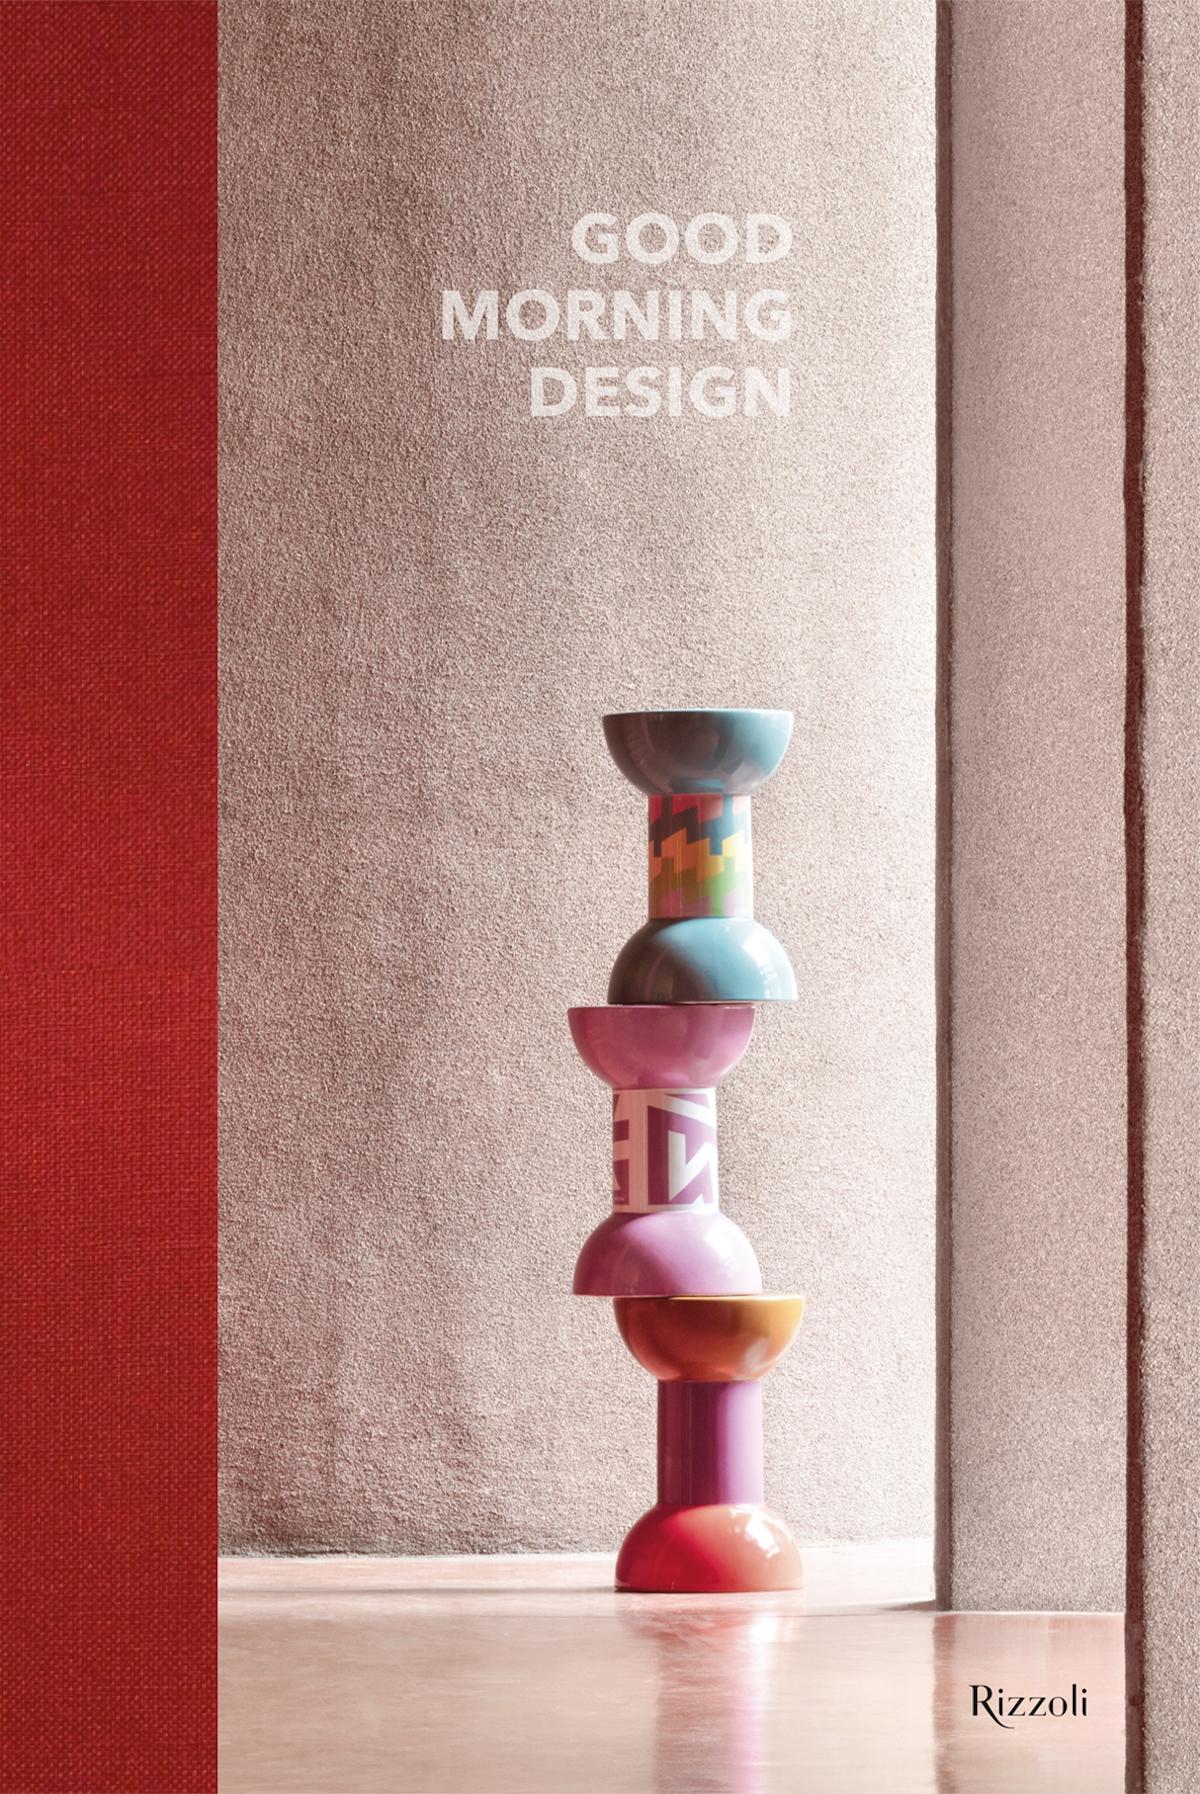 Good Morning Design, Flaminia, Edizioni Rizzoli